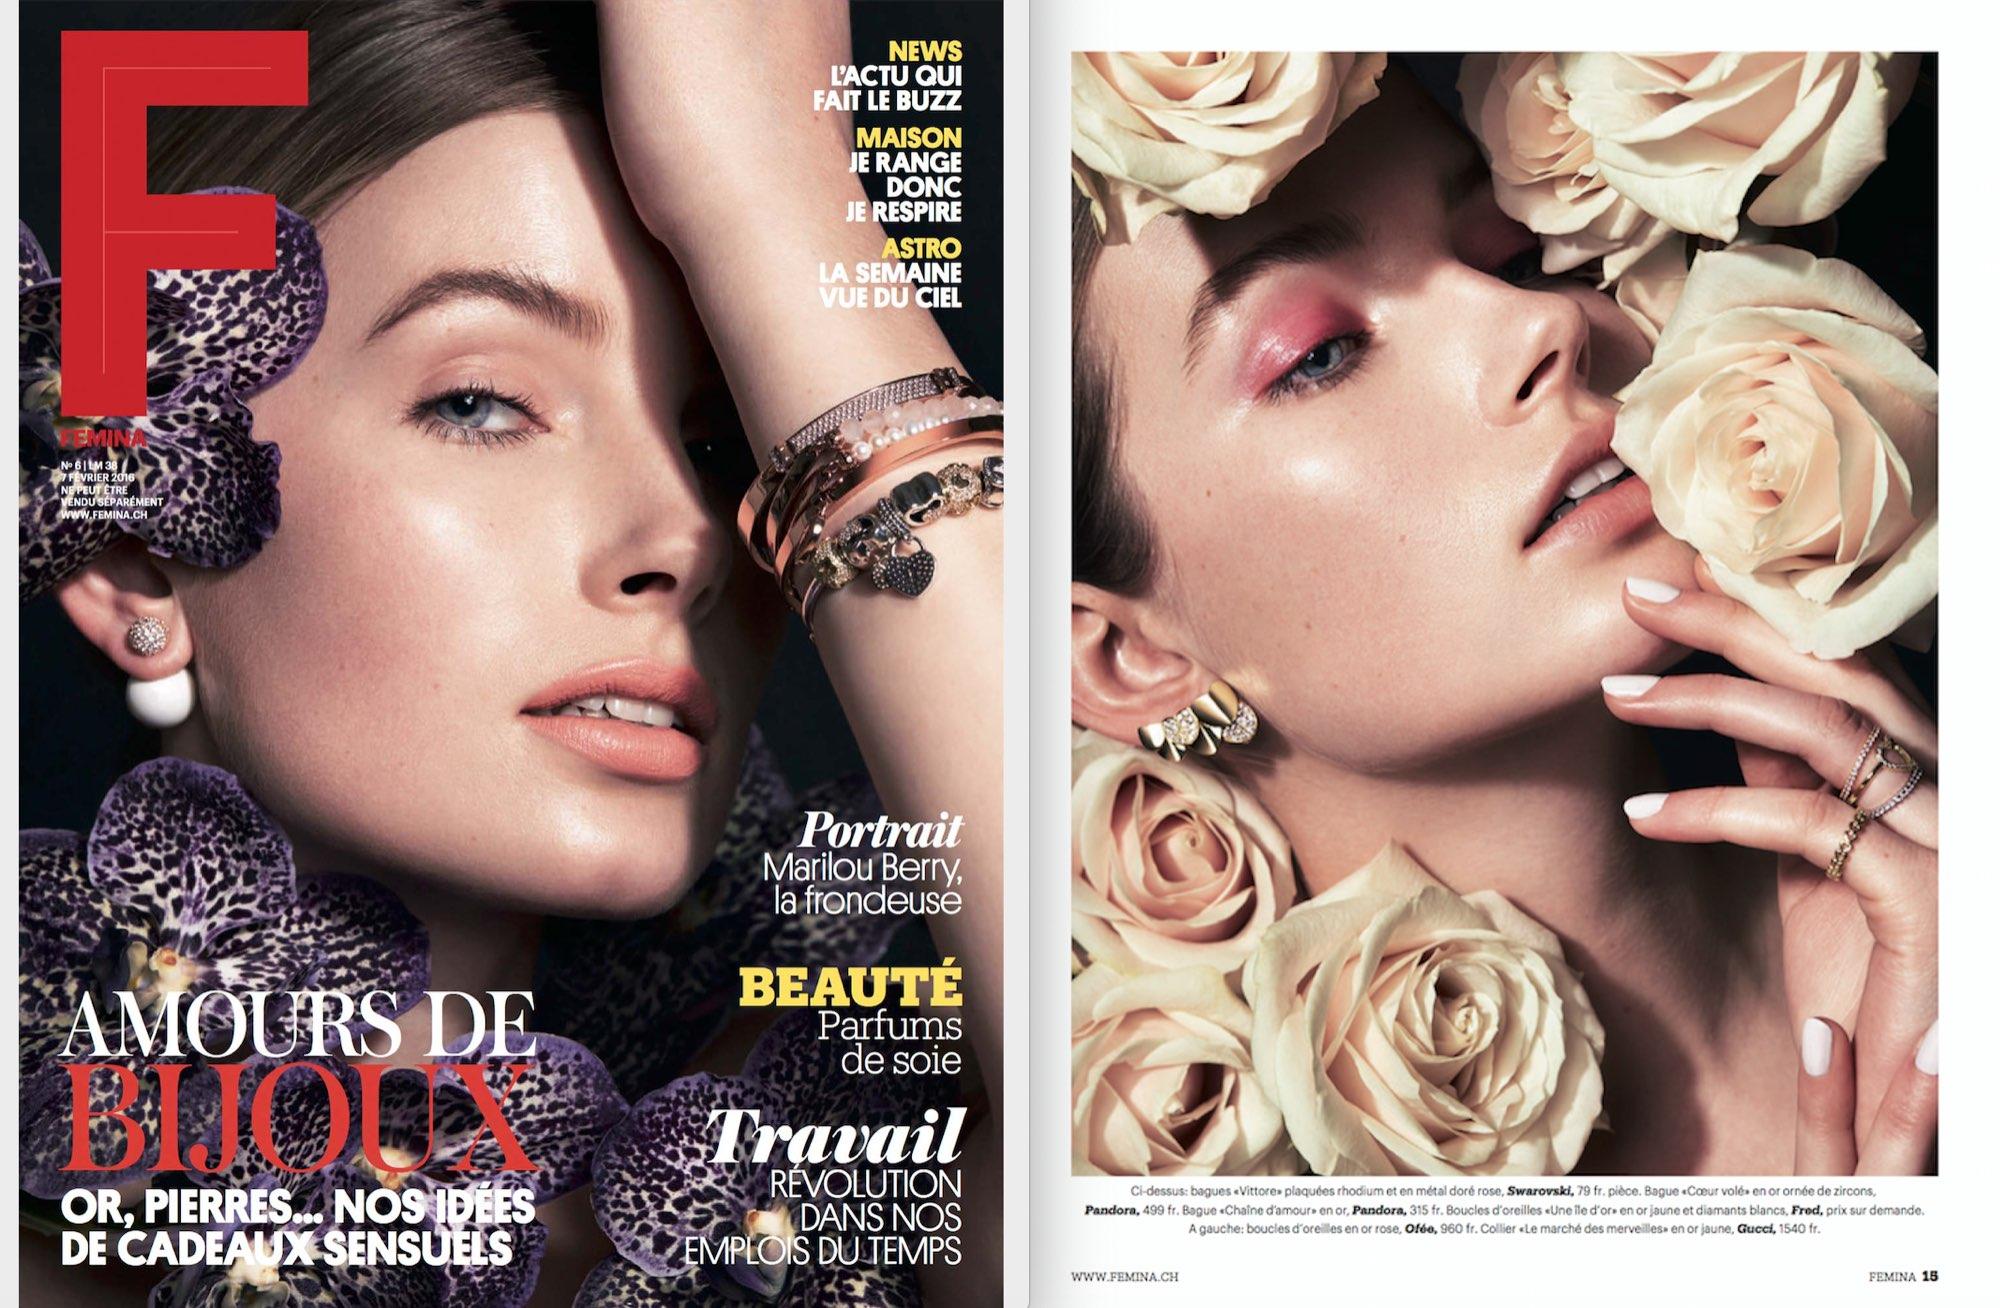 Hair, Nail, Make-up und Fashion styling portfolio / fabienne-pauli - h-m-femina-amours-de-bijoux---fotograf-charles-elie-lathion--ID274-1.jpeg?v=1587038233